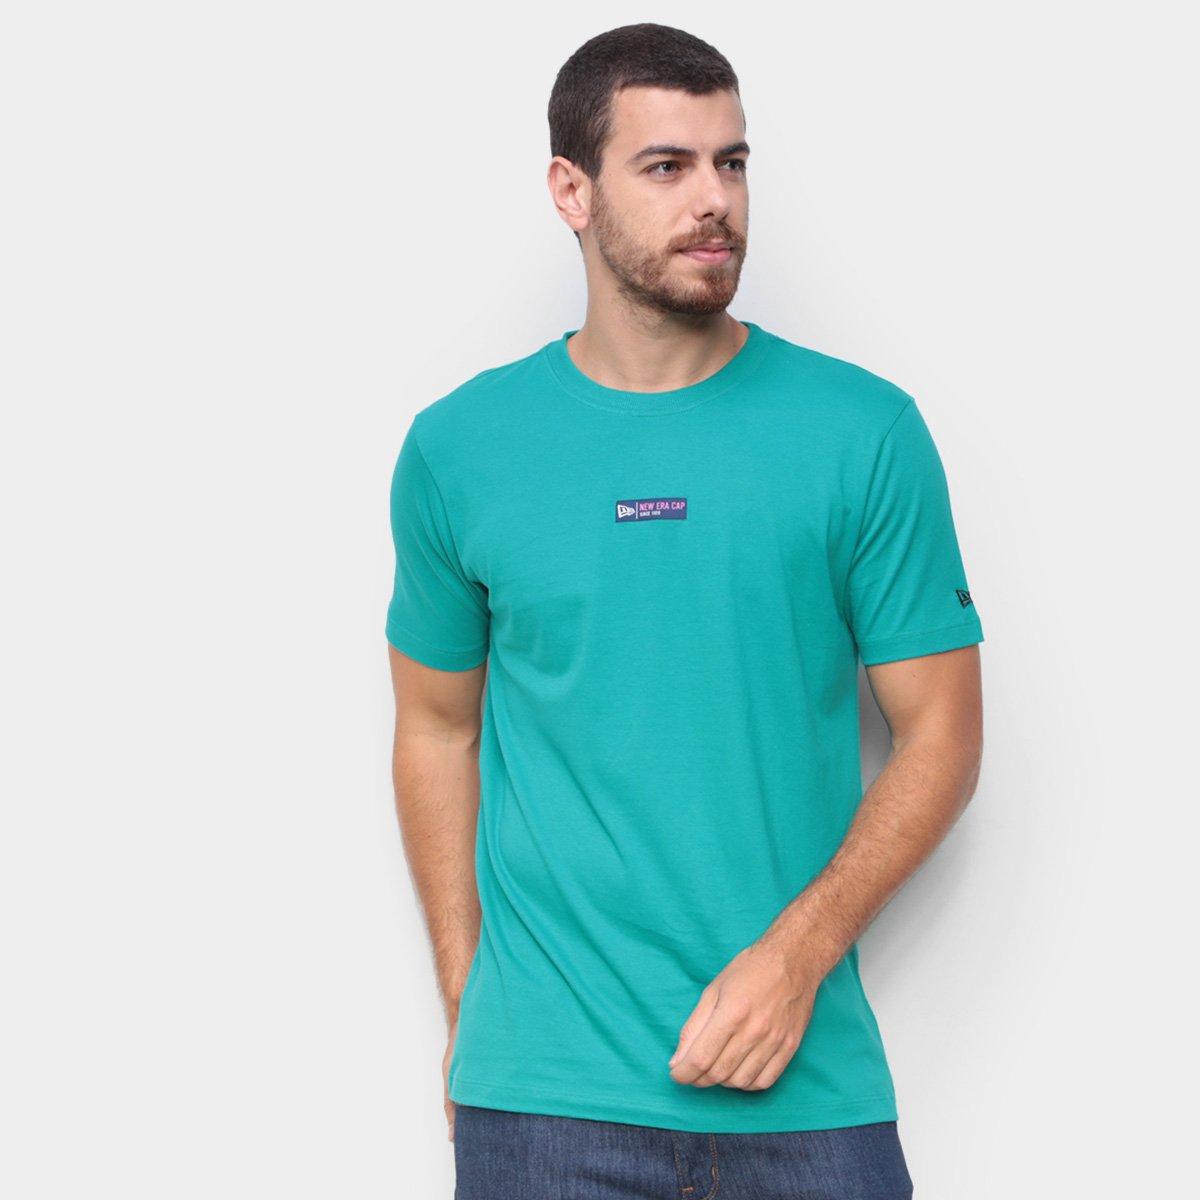 Camiseta New Era Summer Times Company Masculina